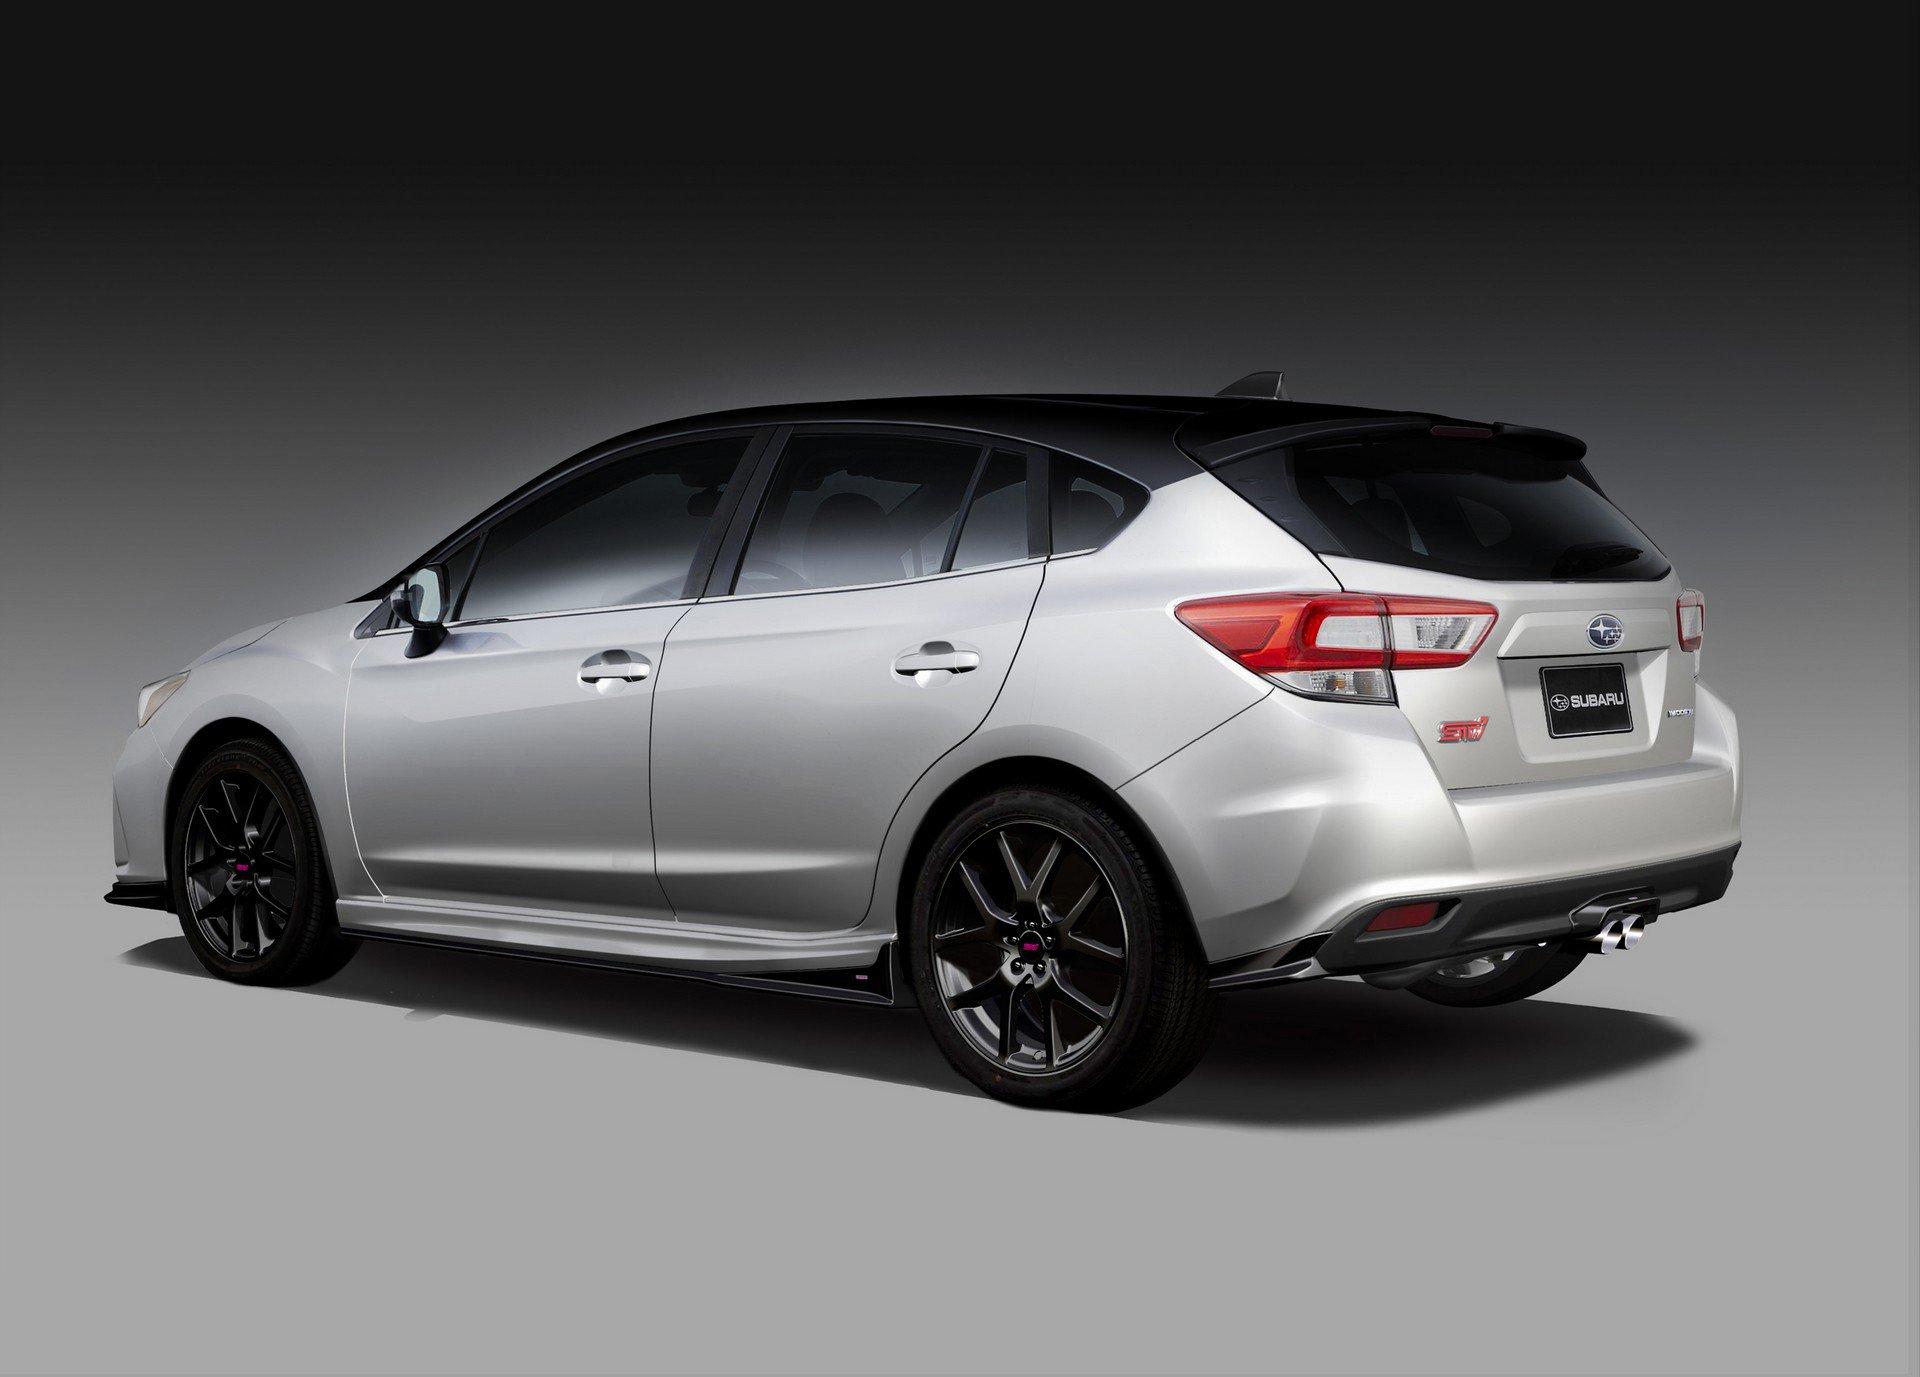 Subaru Unveils Sti Forester And Impreza Concepts Ahead Of 2019 Tokyo